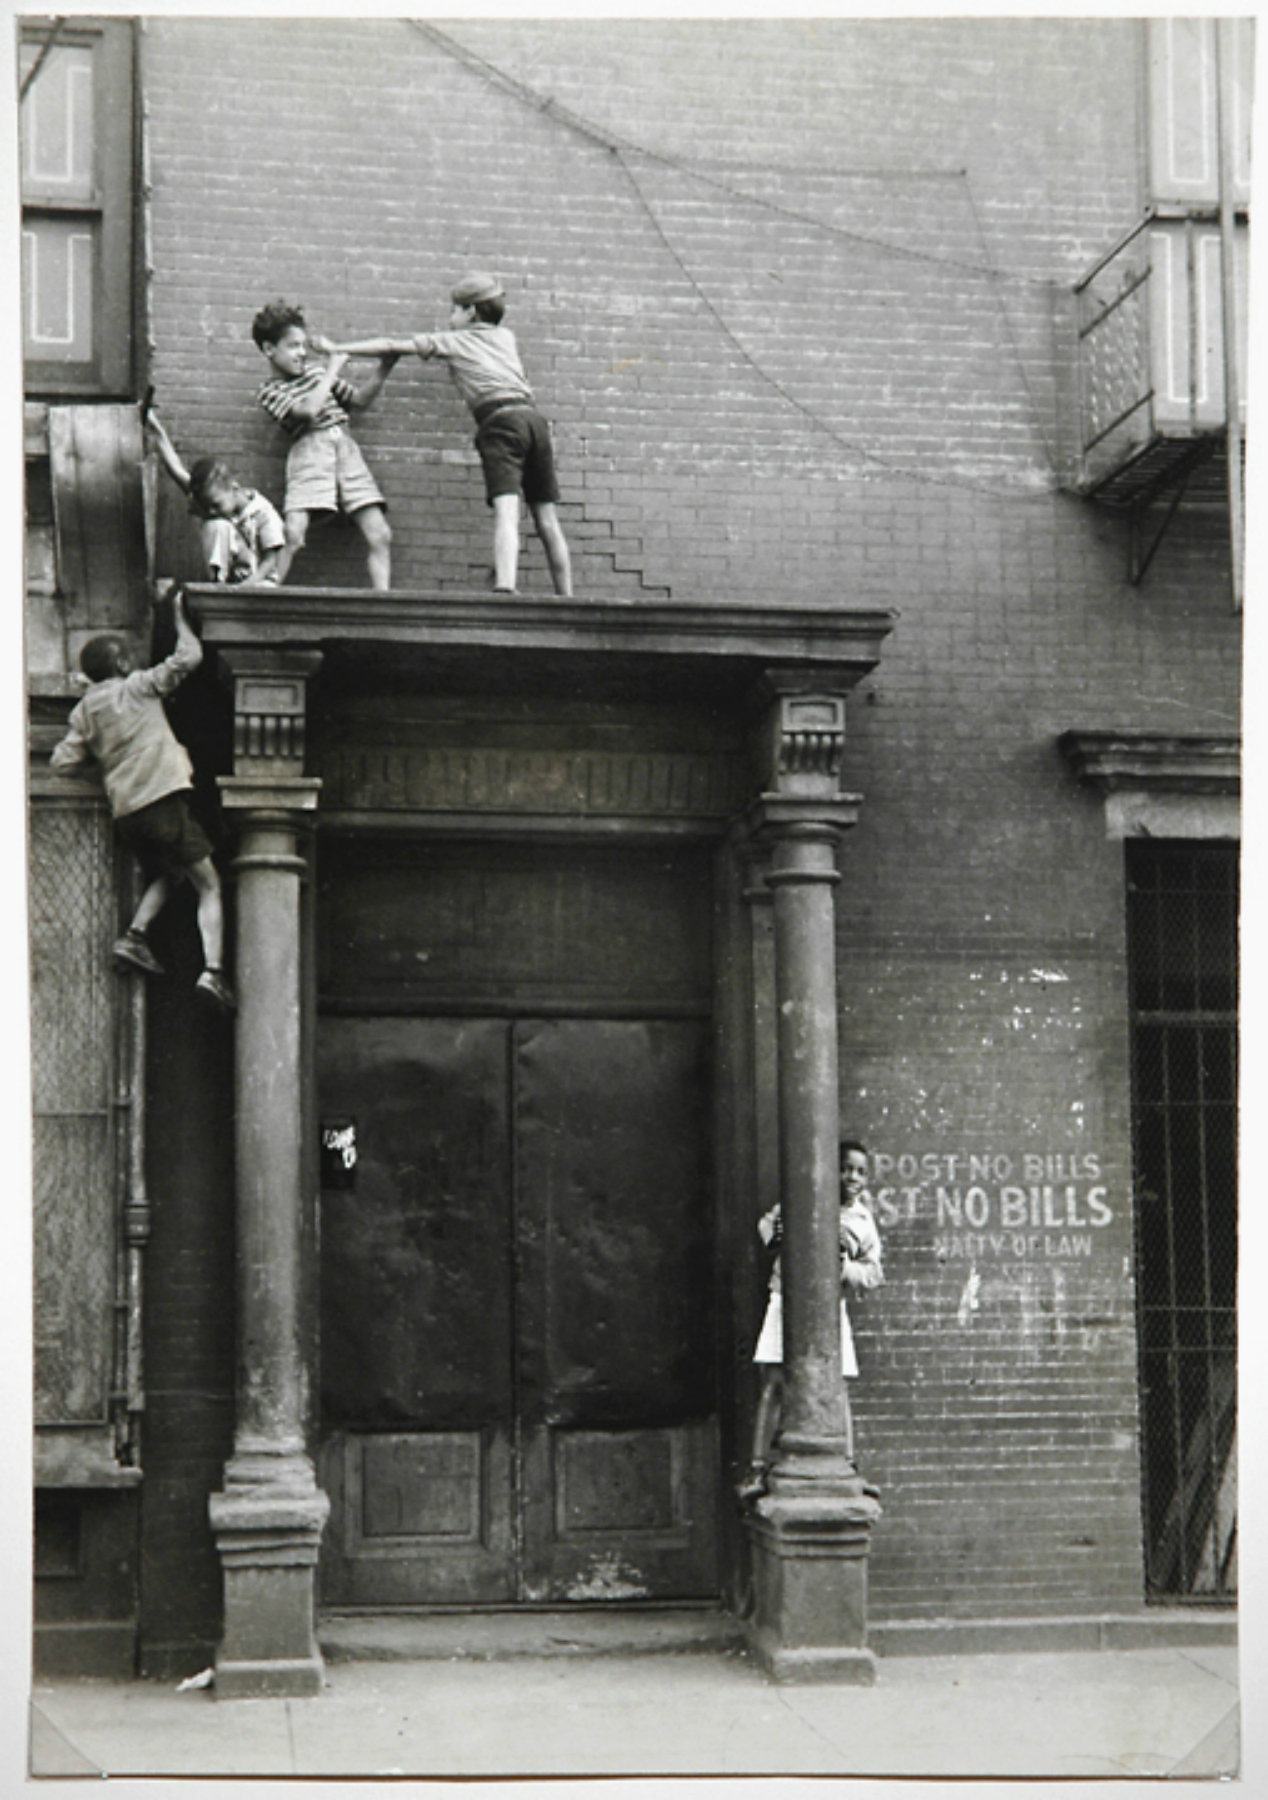 CHILD'S PLAY...Helen Levitt captures kids climbing on to a doorway